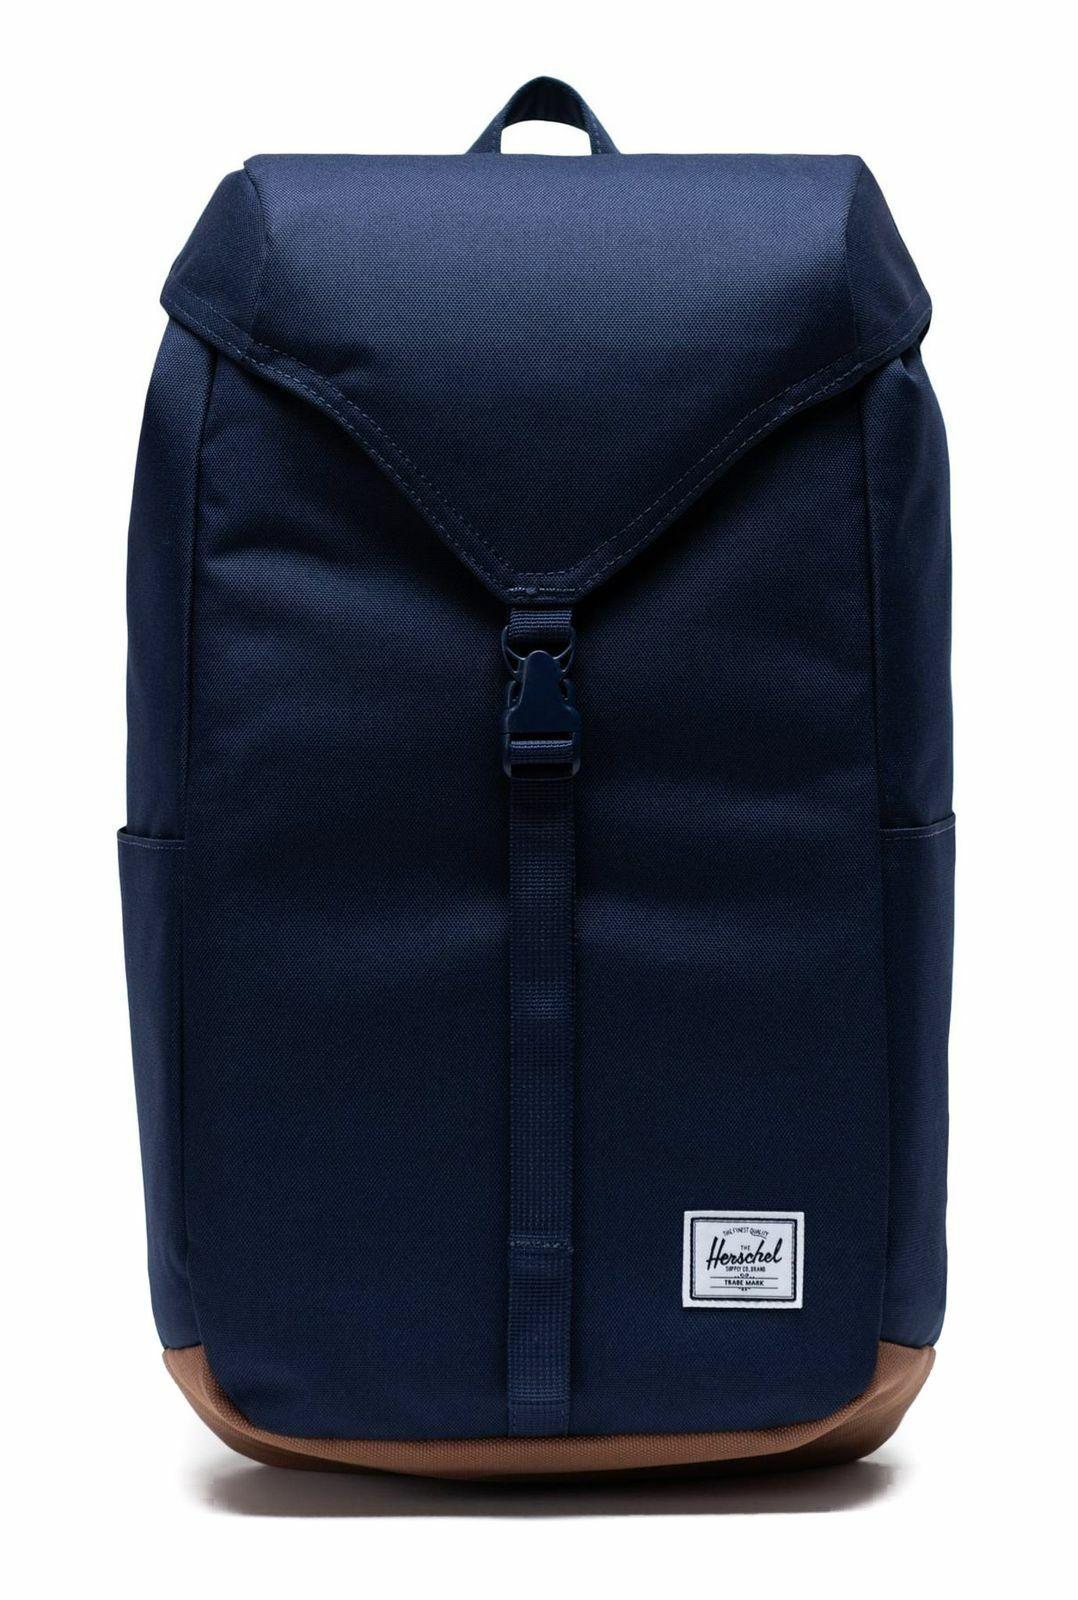 Backpack Herschel Thompson Peacoat  Saddle Marronee